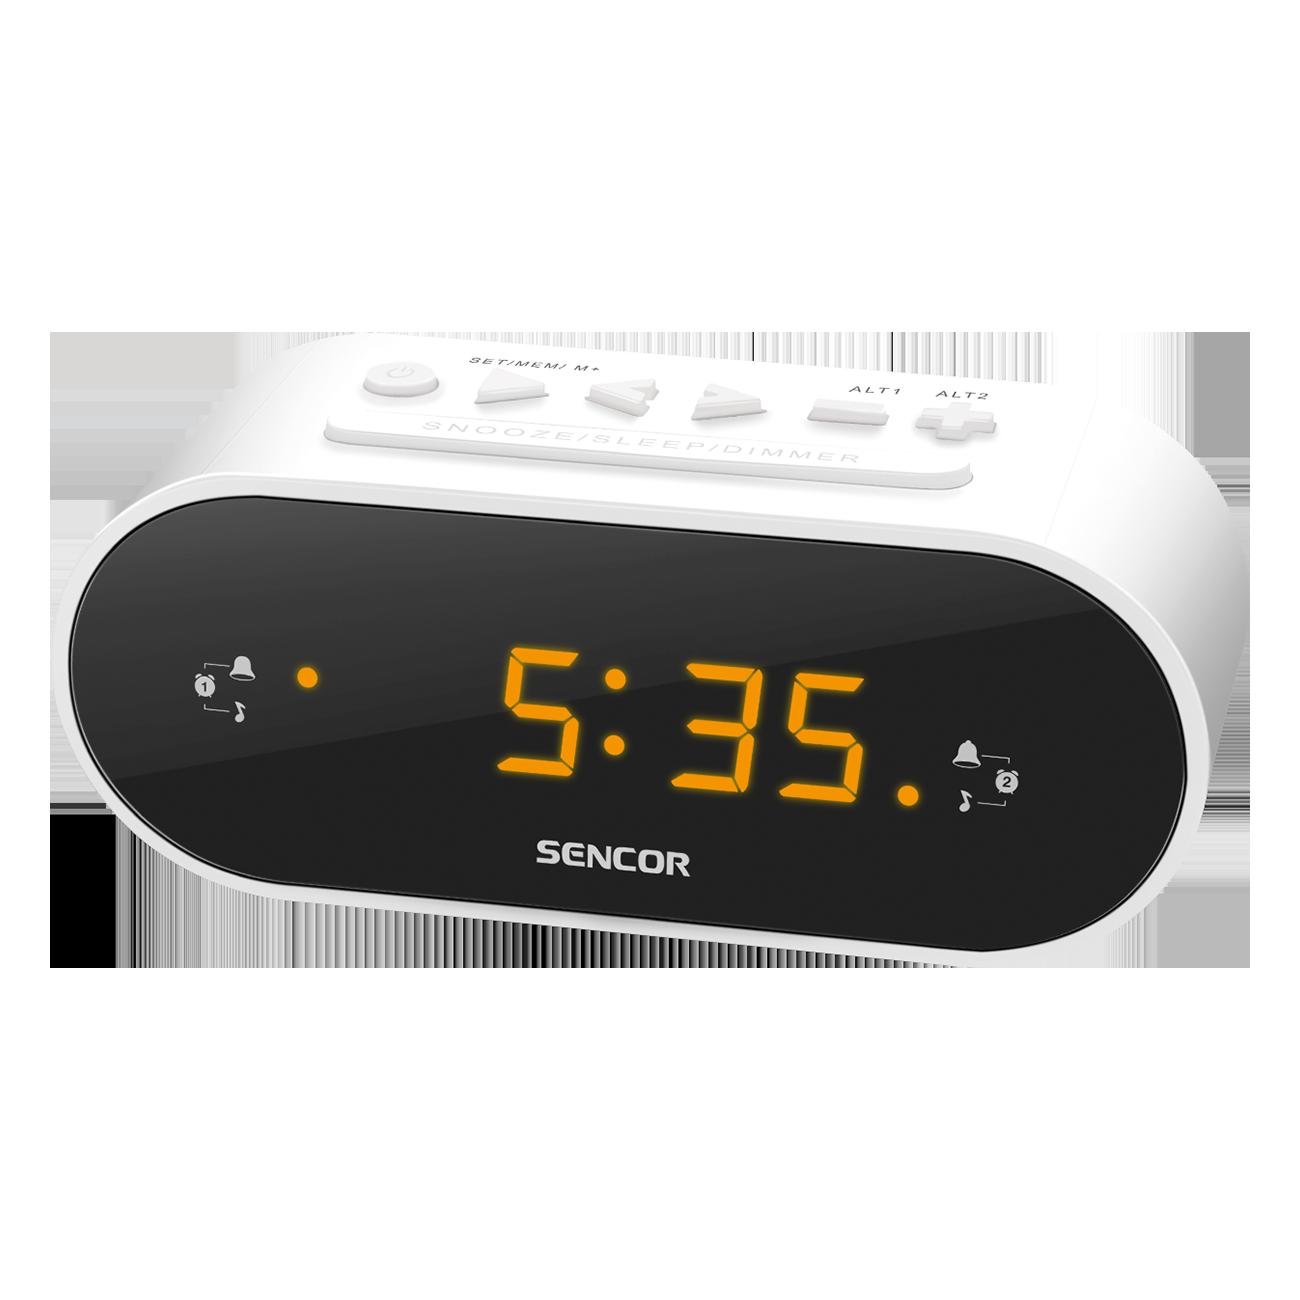 Radio Alarm Clock SENCOR SRC 1100 W radio, radiopulksteņi